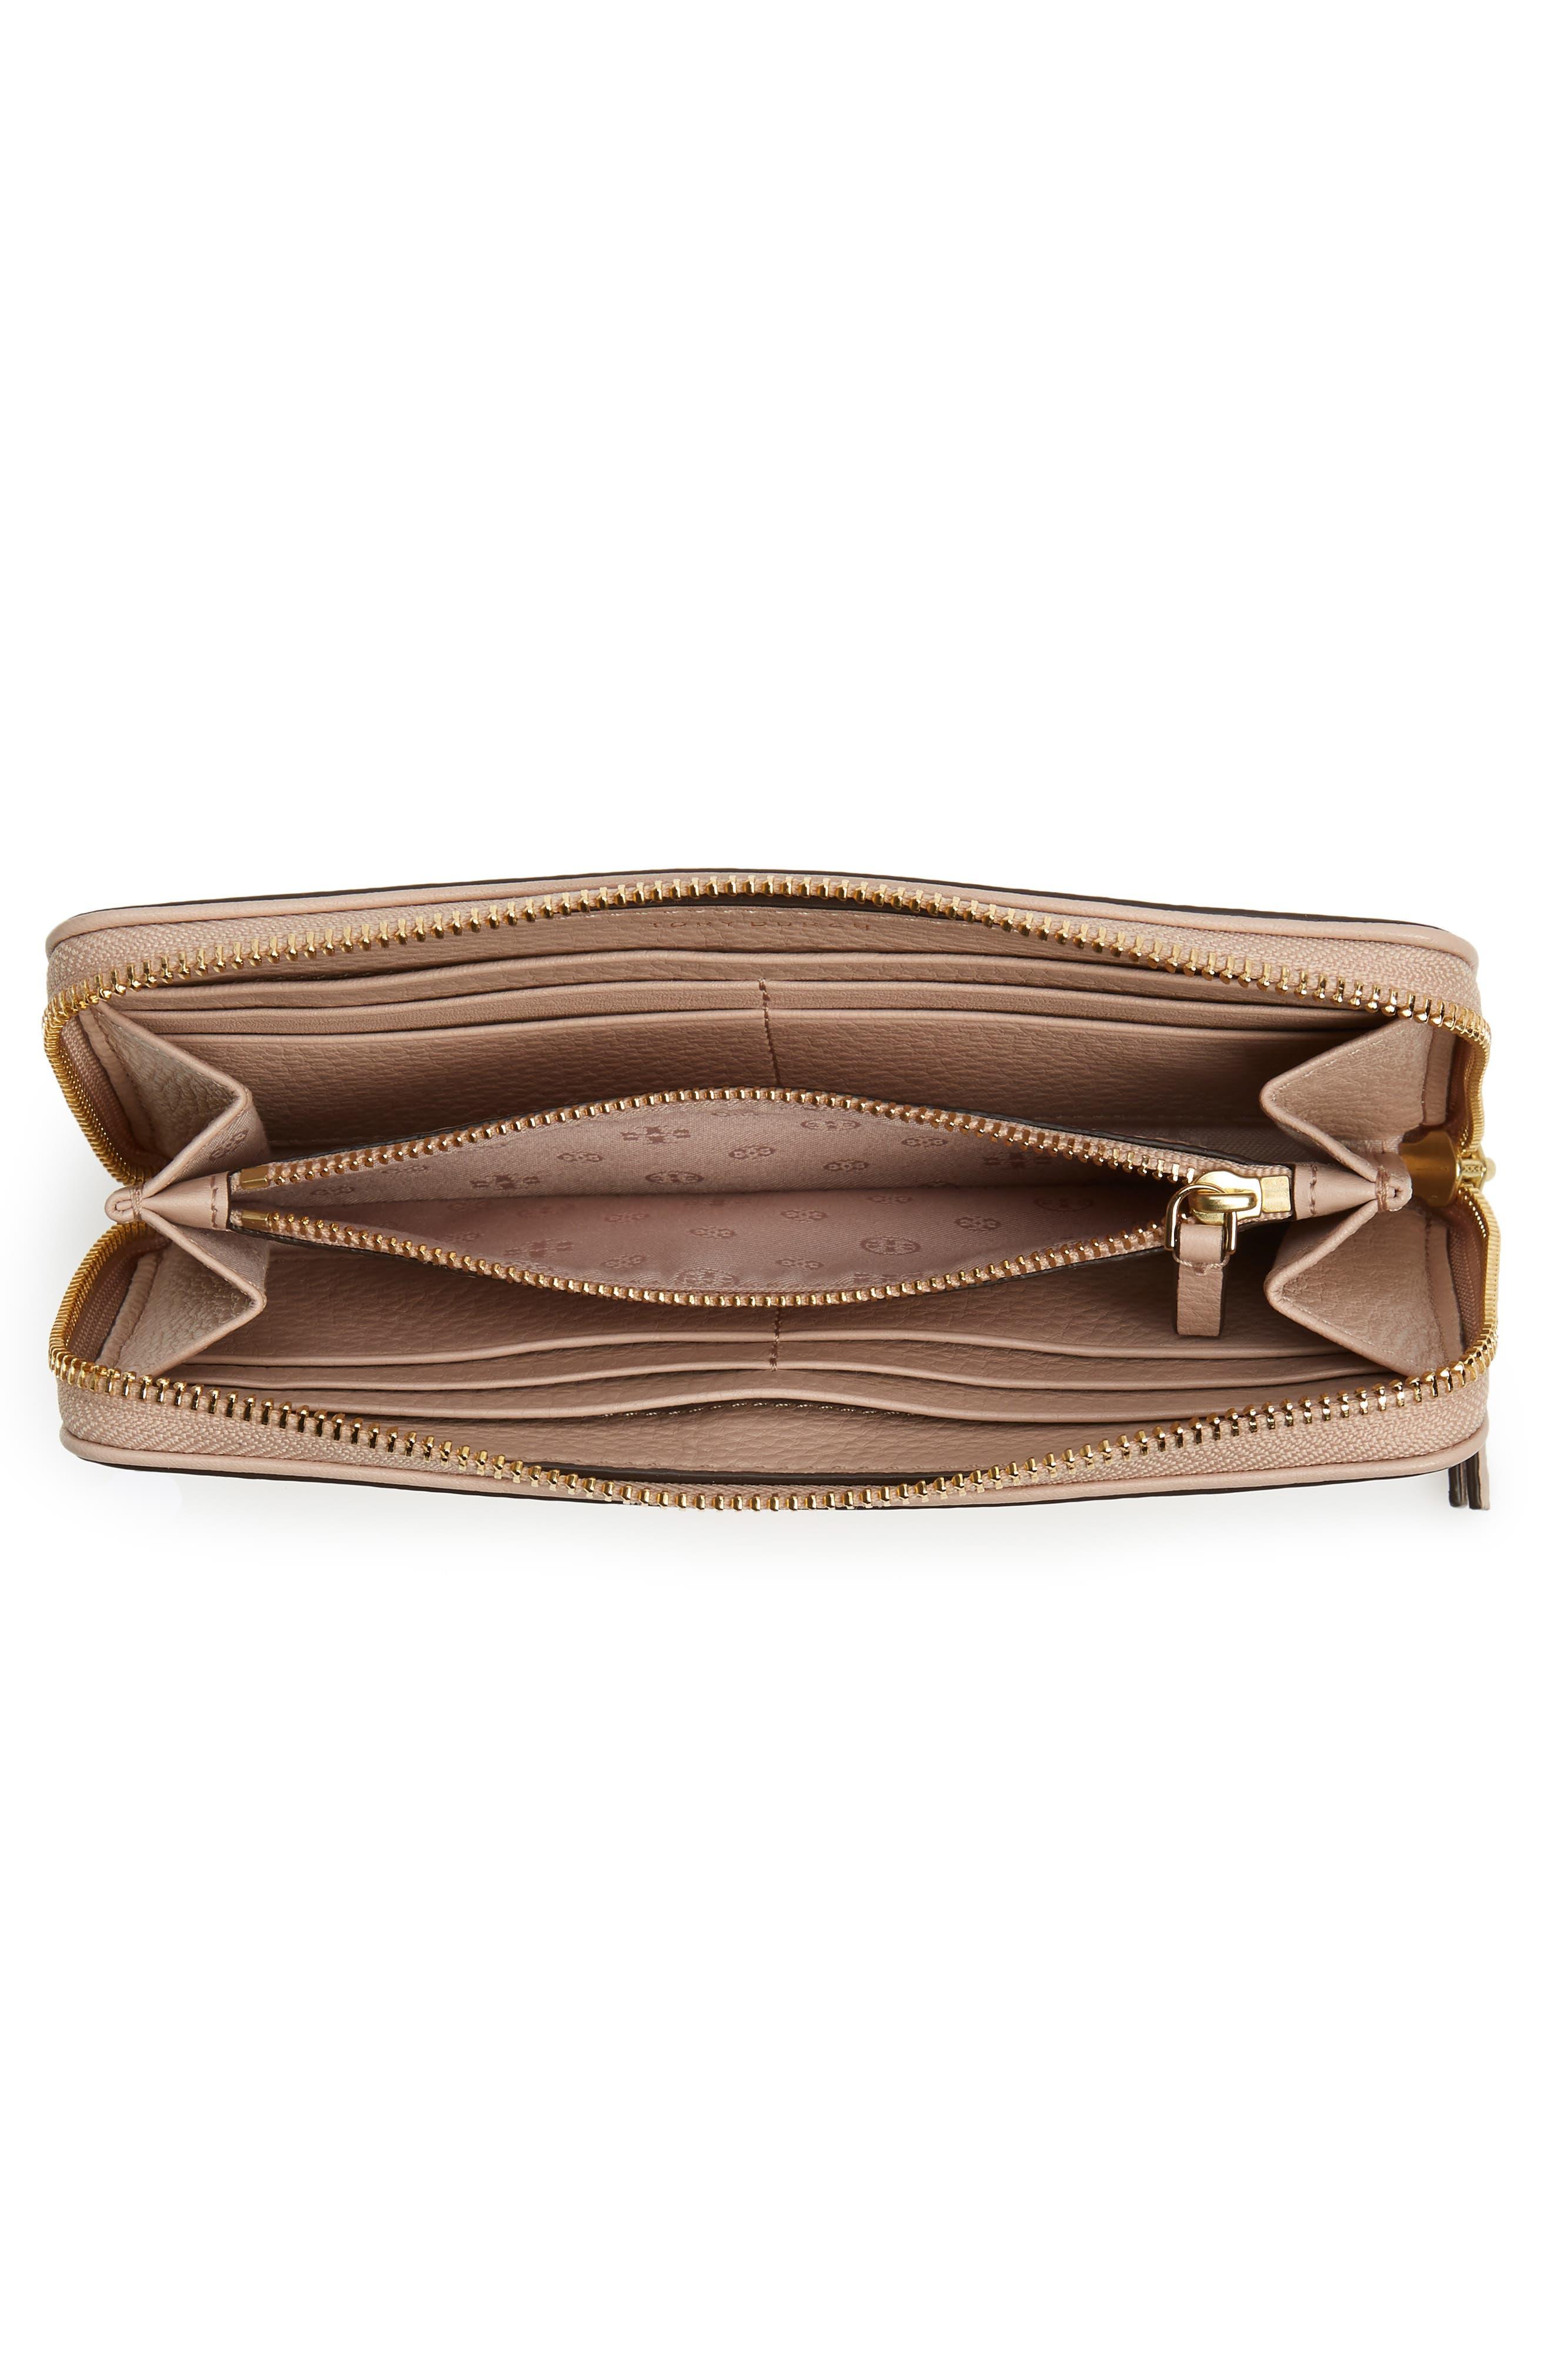 Marsden Leather Zip Around Wallet,                             Alternate thumbnail 12, color,